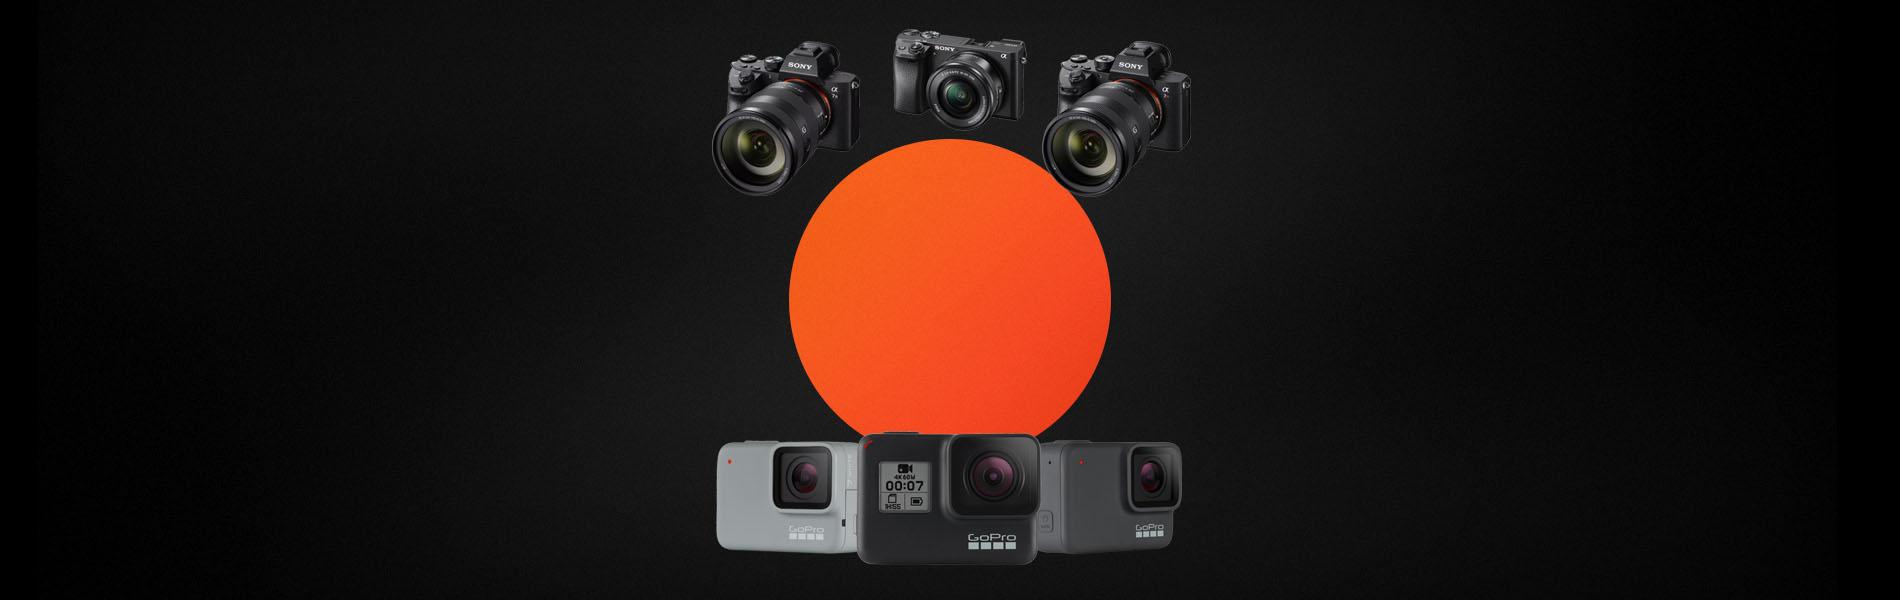 black friday camerabanner